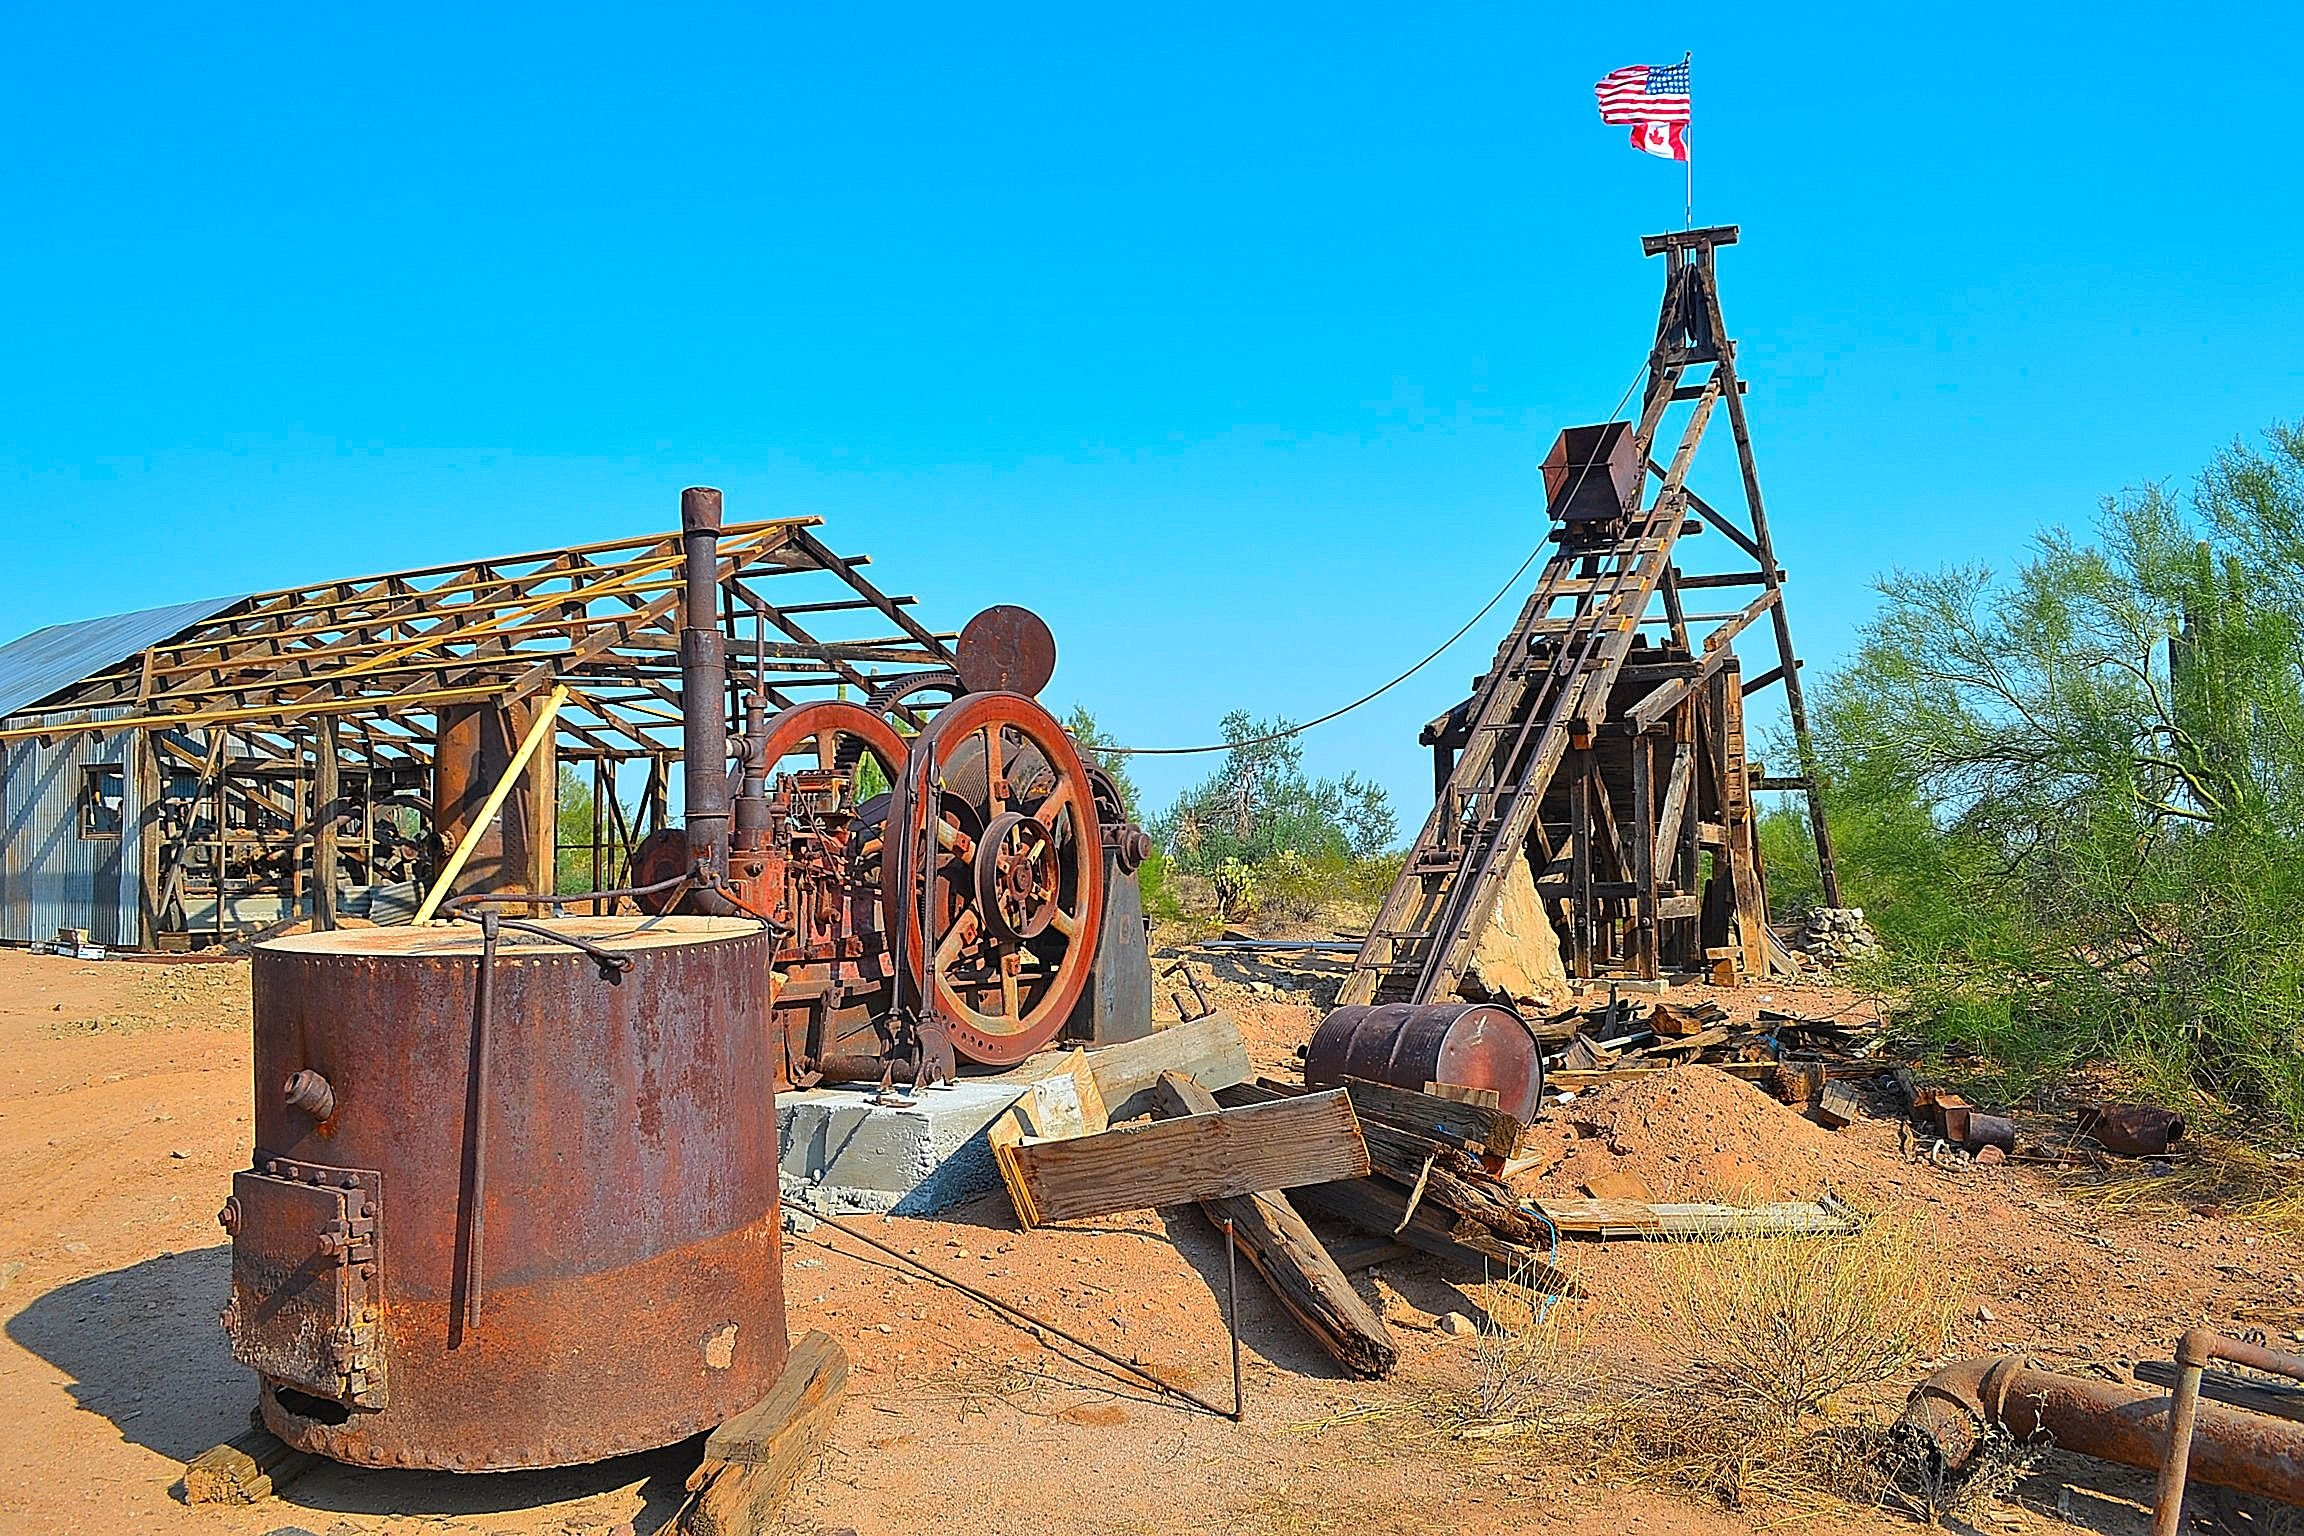 Vulture Mine equipment left behind. (Source: Eric Zotcavage)